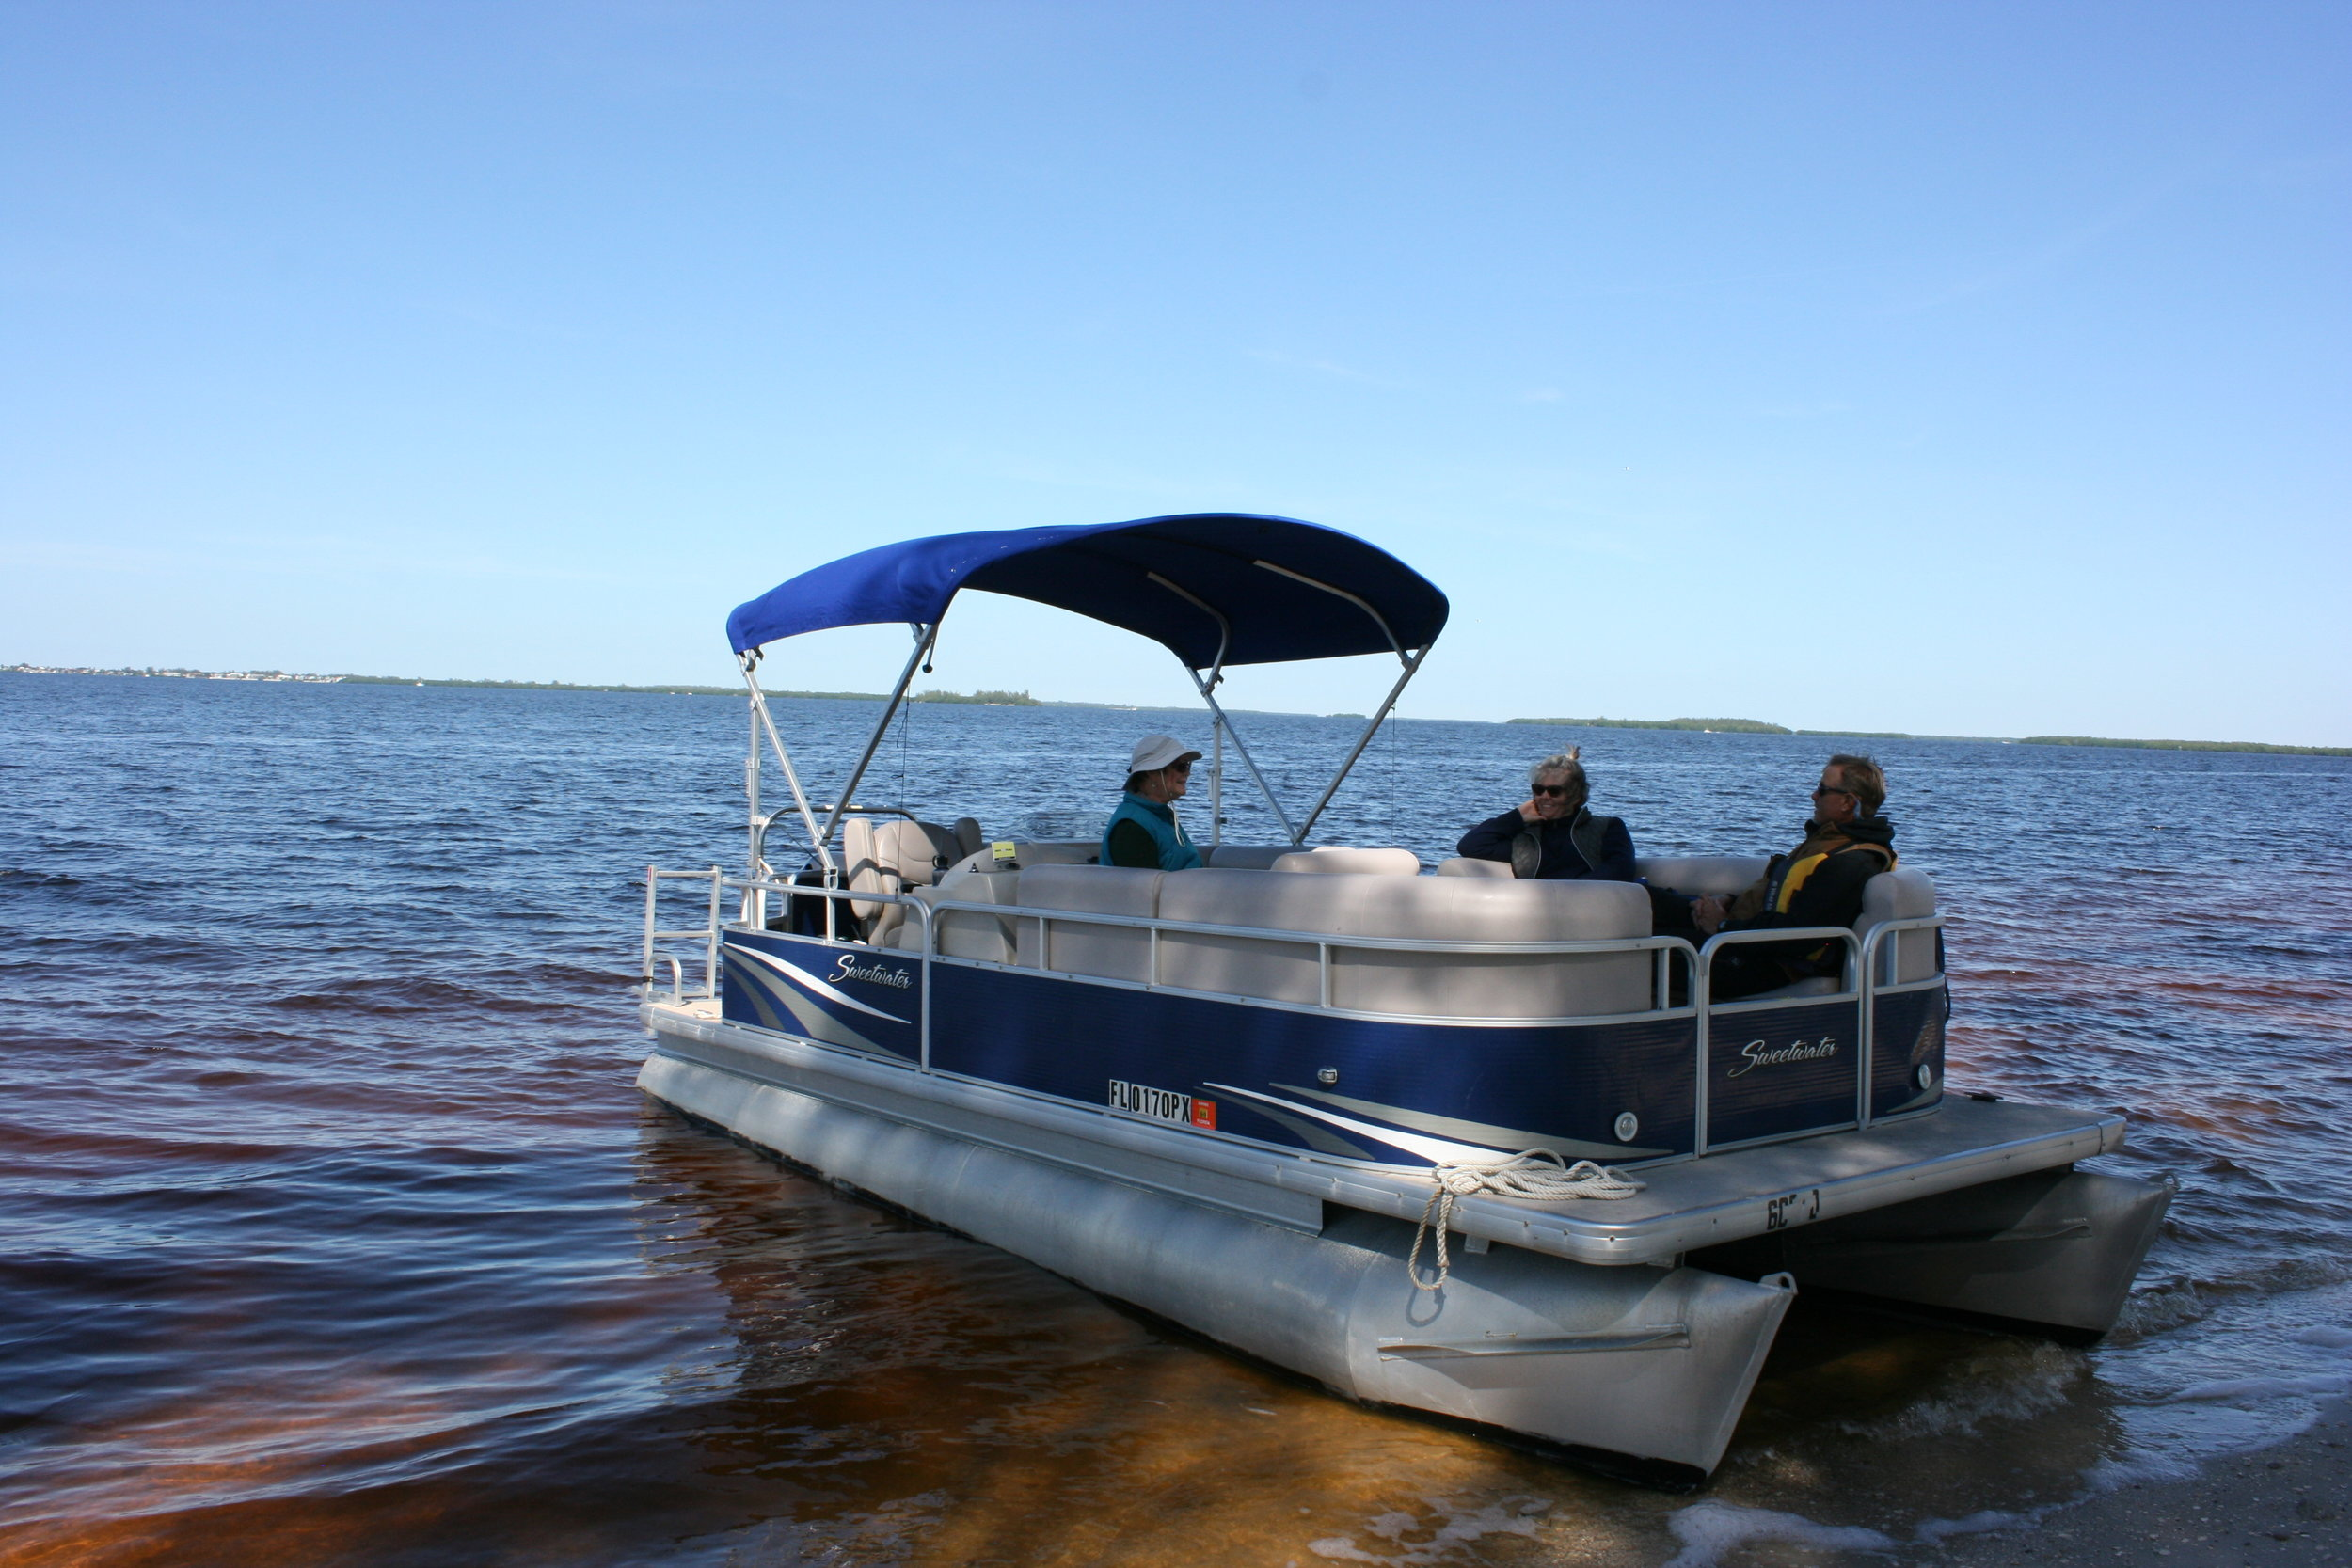 Sanibel Sea School's pontoon boat.